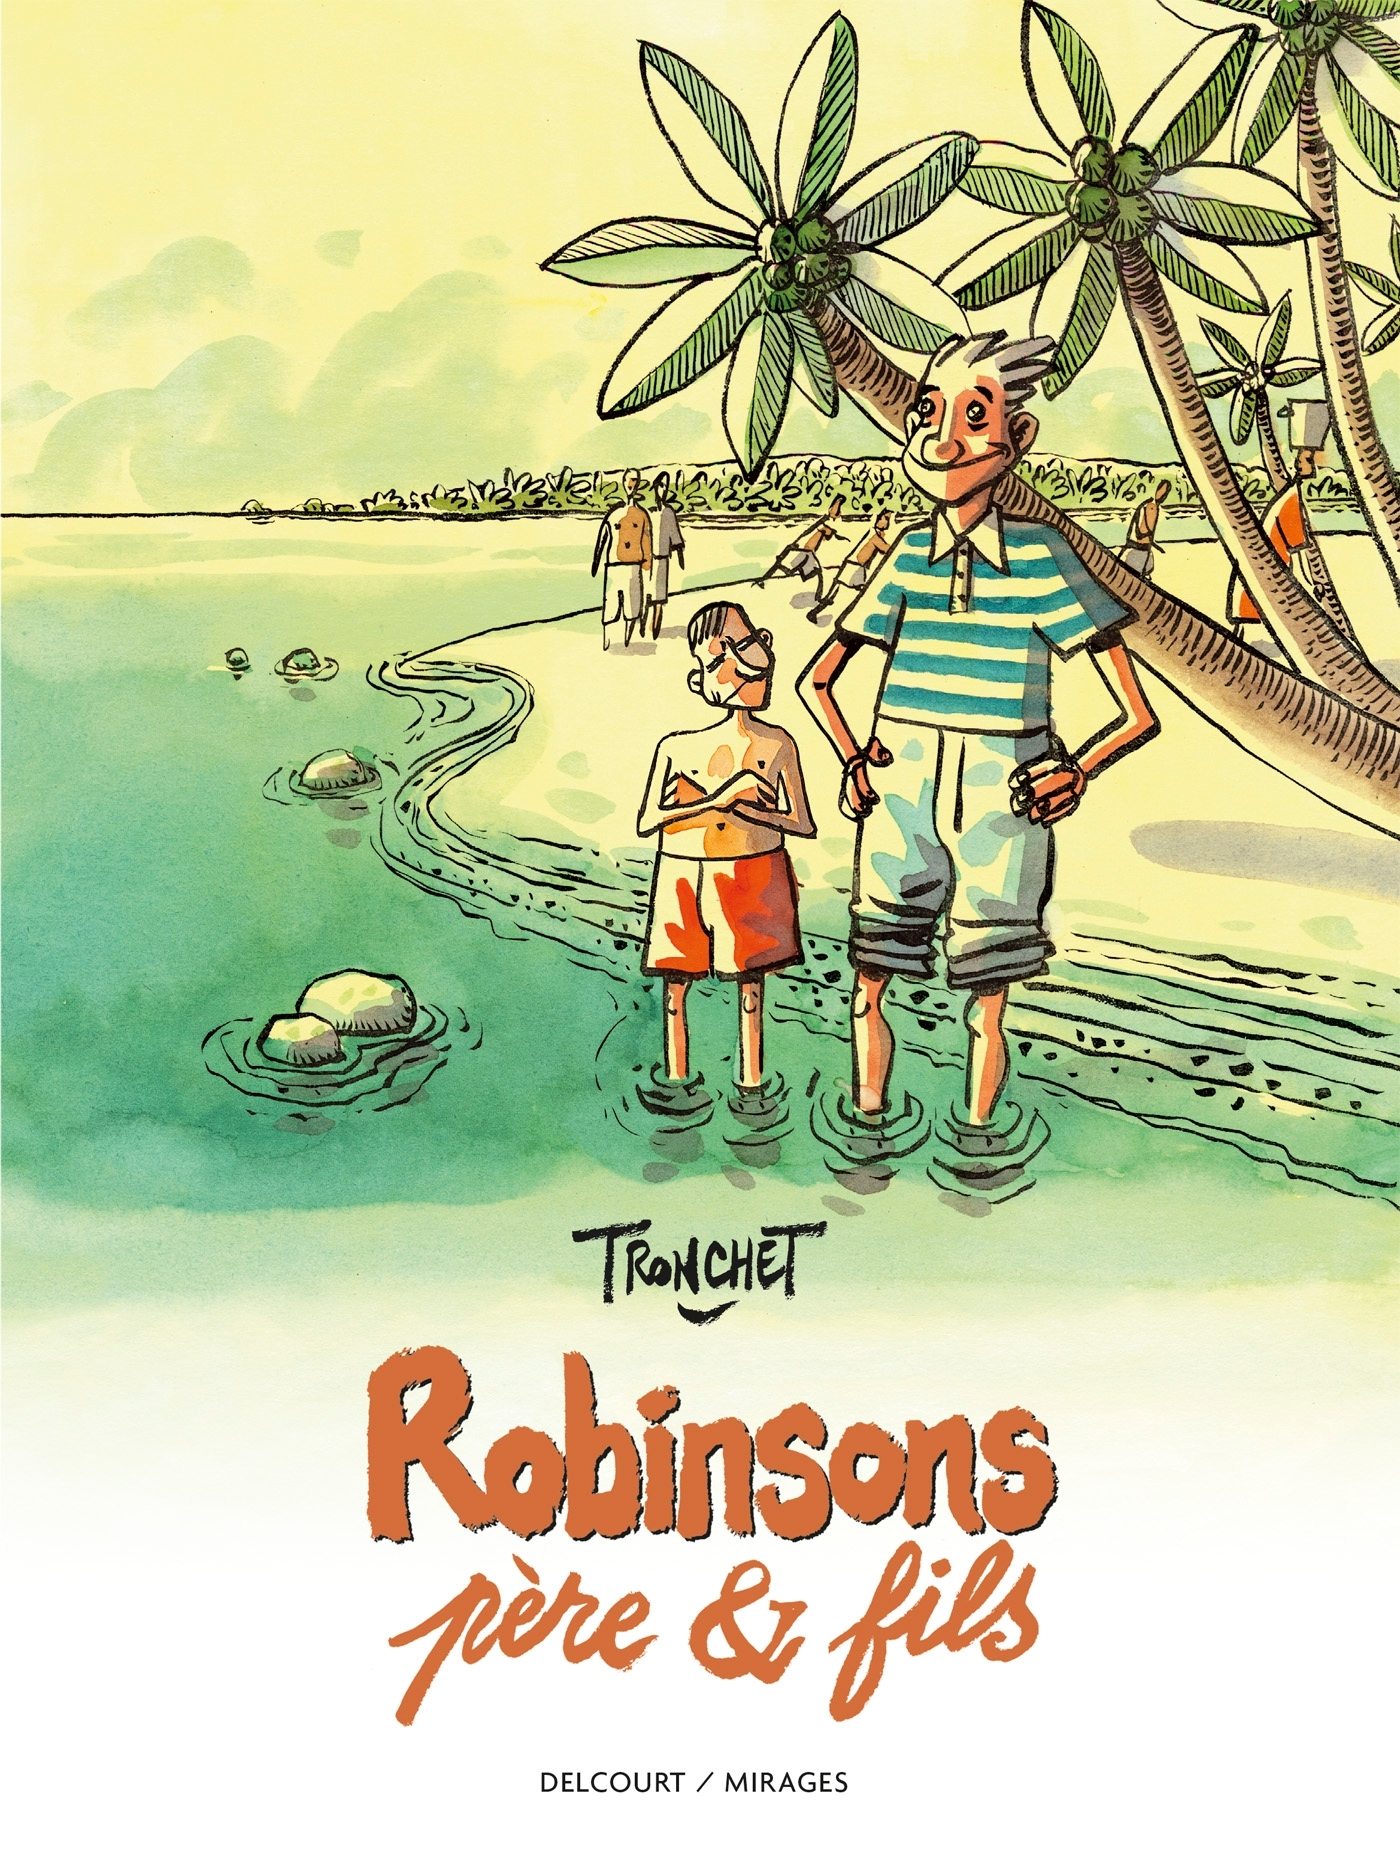 ROBINSONS, PERE & FILS